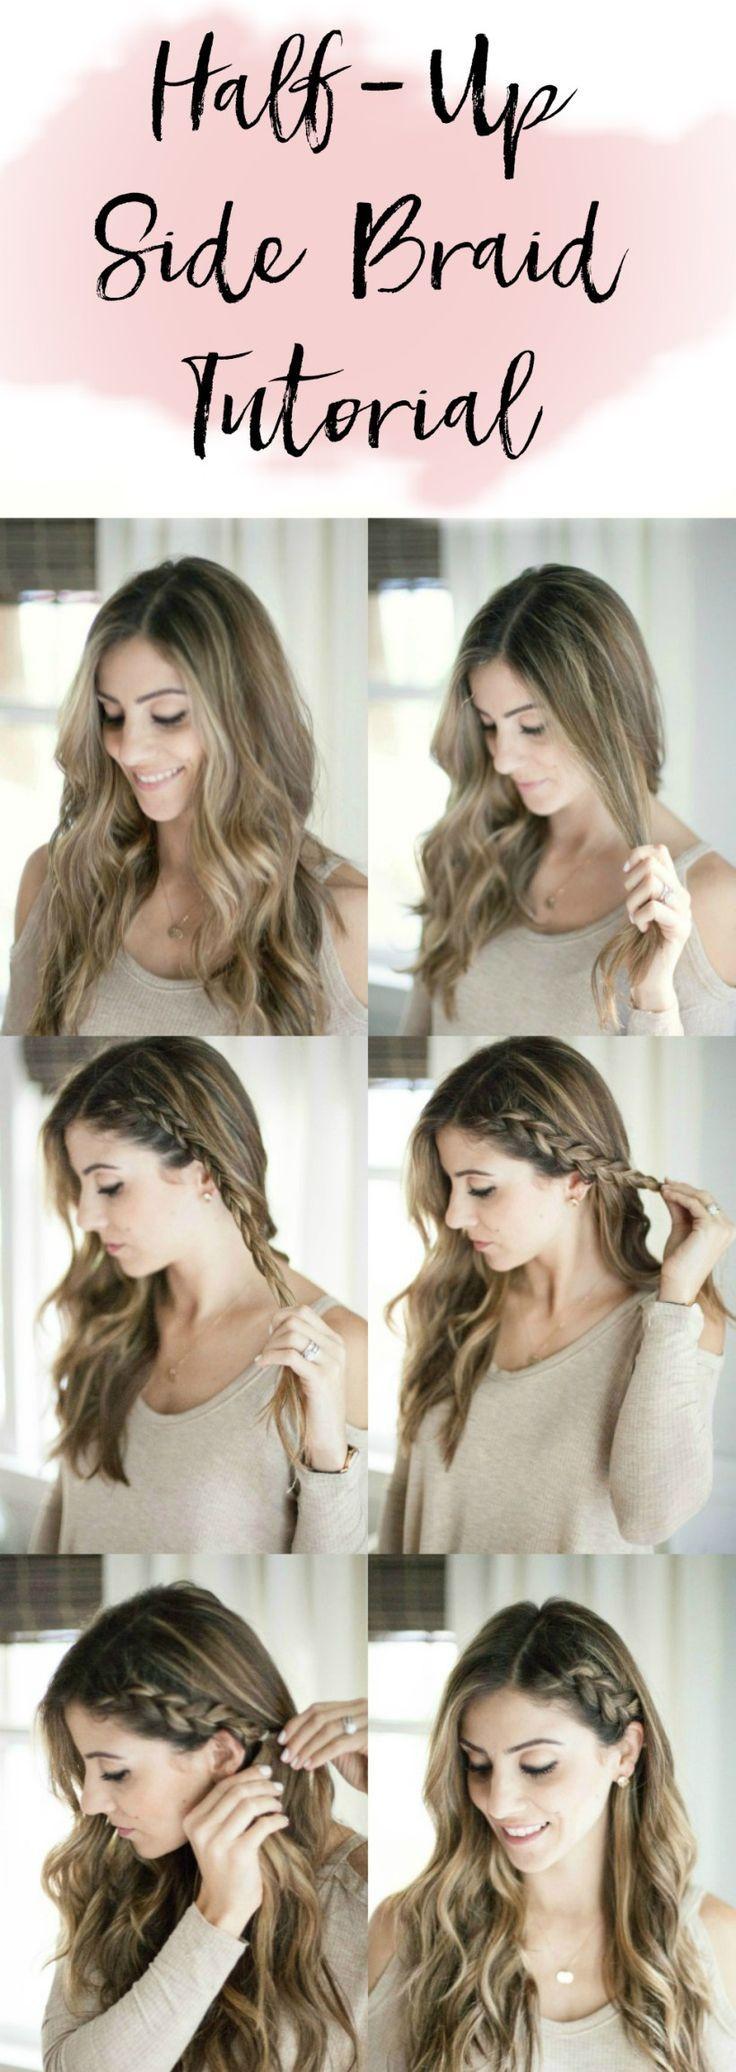 Beauty half up side braid hair tutorial pinterest braid hair